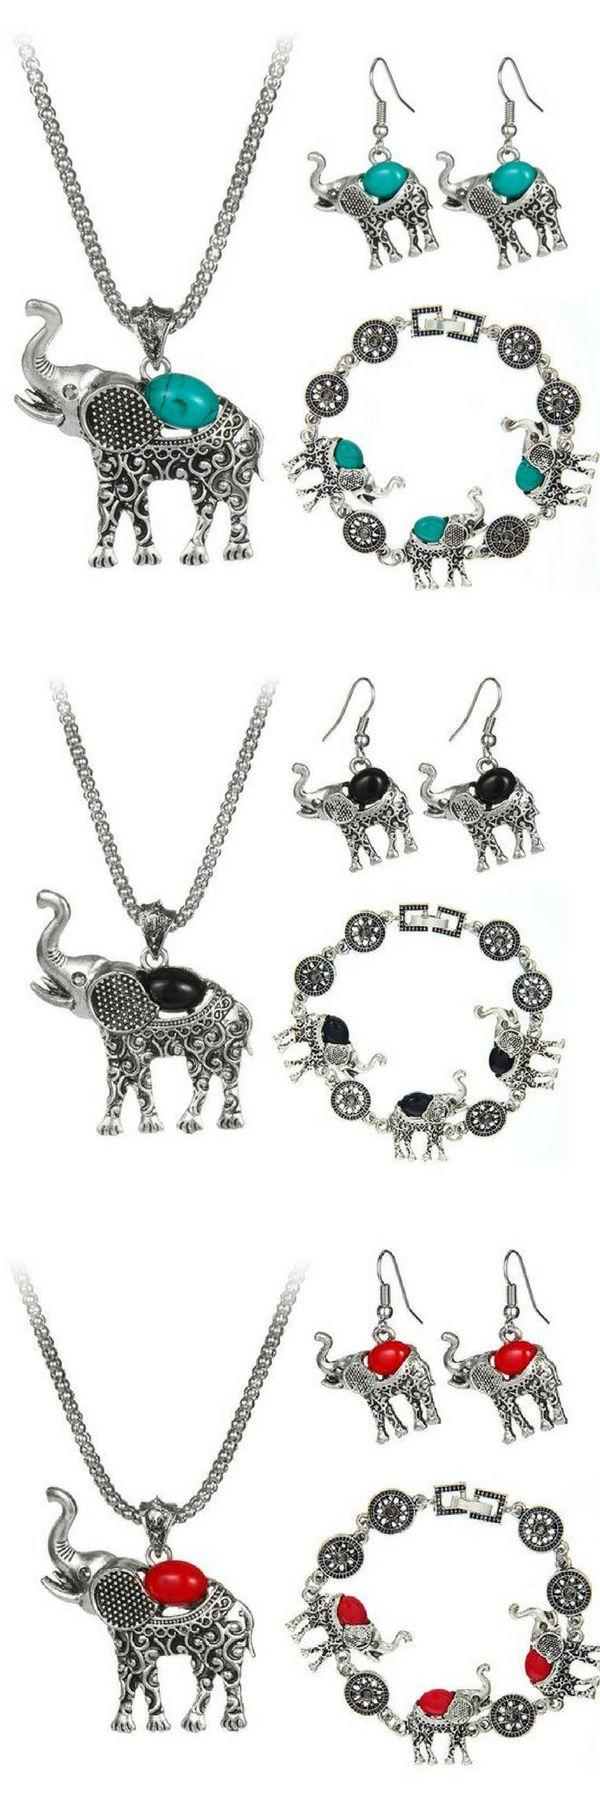 Elephant jewelry set for ALL Elephant lovers    elephant jewelry | elephant jewelry necklace | elephant jewelry diy | elephant jewelry bracelets | Funky Elephant Jewelry | Elephant Jewelry | elephant jewelry. | boho jewelry | boho jewelry diy | boho jewelry necklace | boho jewelry rings | boho jewelry bracelet | Handmade Boho jewelry    #bohochic #bohojewelry #elephant #jewelrysets #pretty #onsale